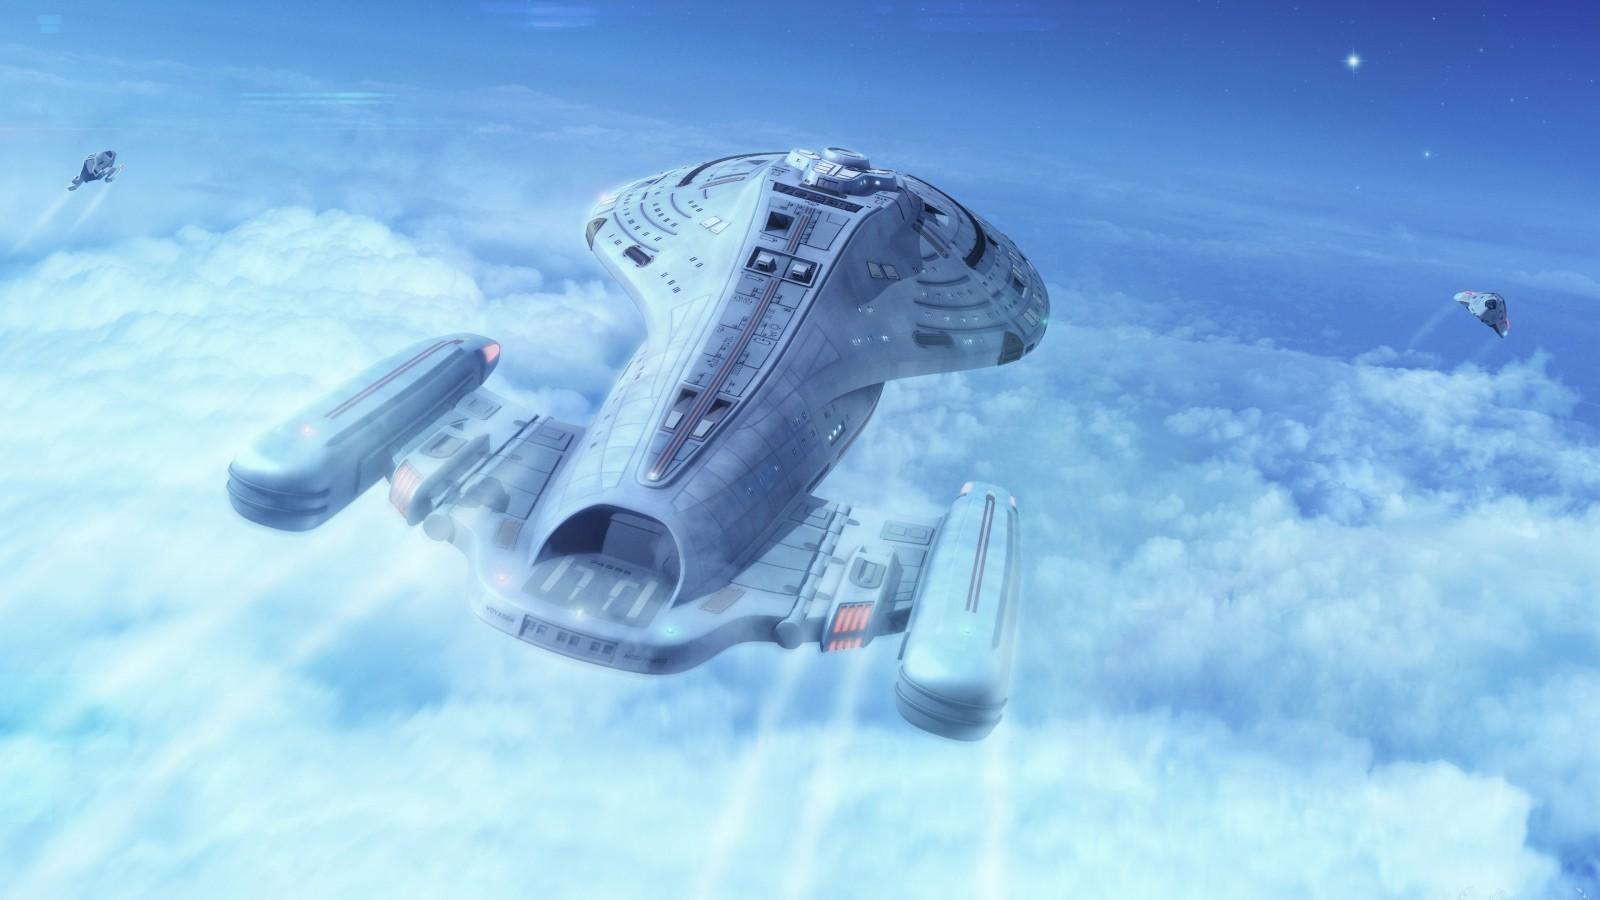 Top Class 3d Wallpapers Star Trek Voyager Spaceship 4k Wallpapers Hd Wallpapers